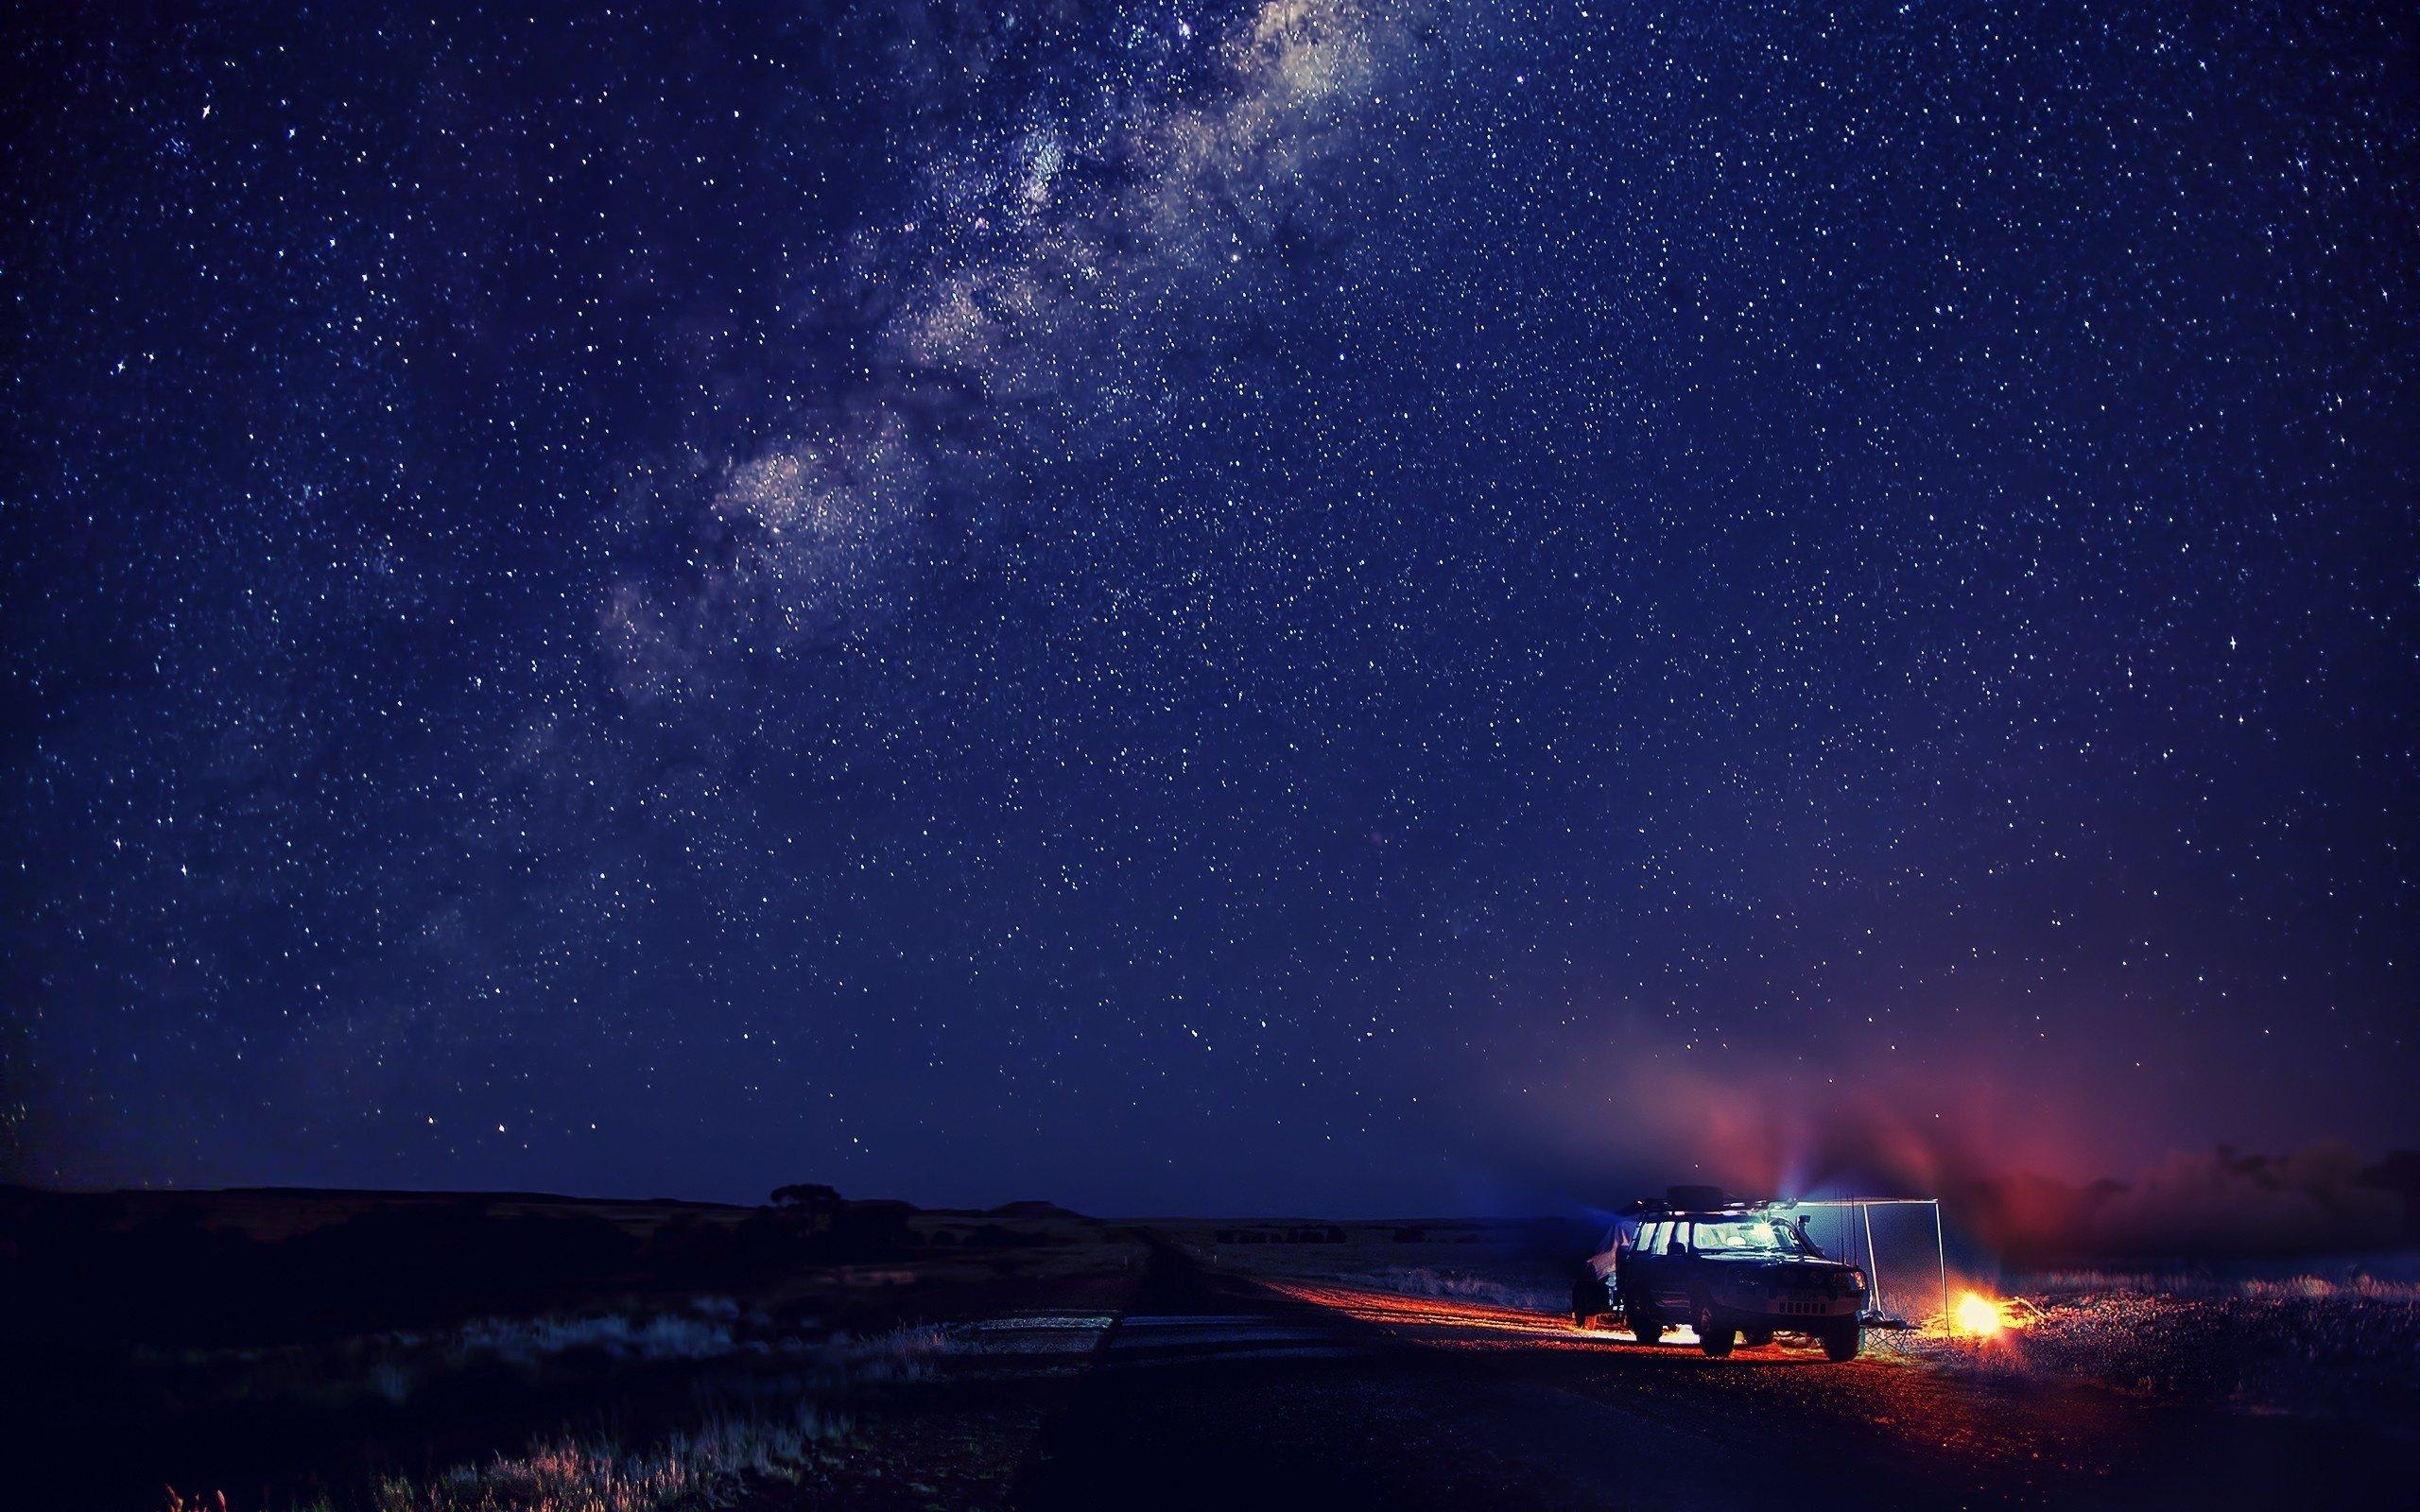 Snow Sky Winter Car Night Stars Mood Space Wallpaper